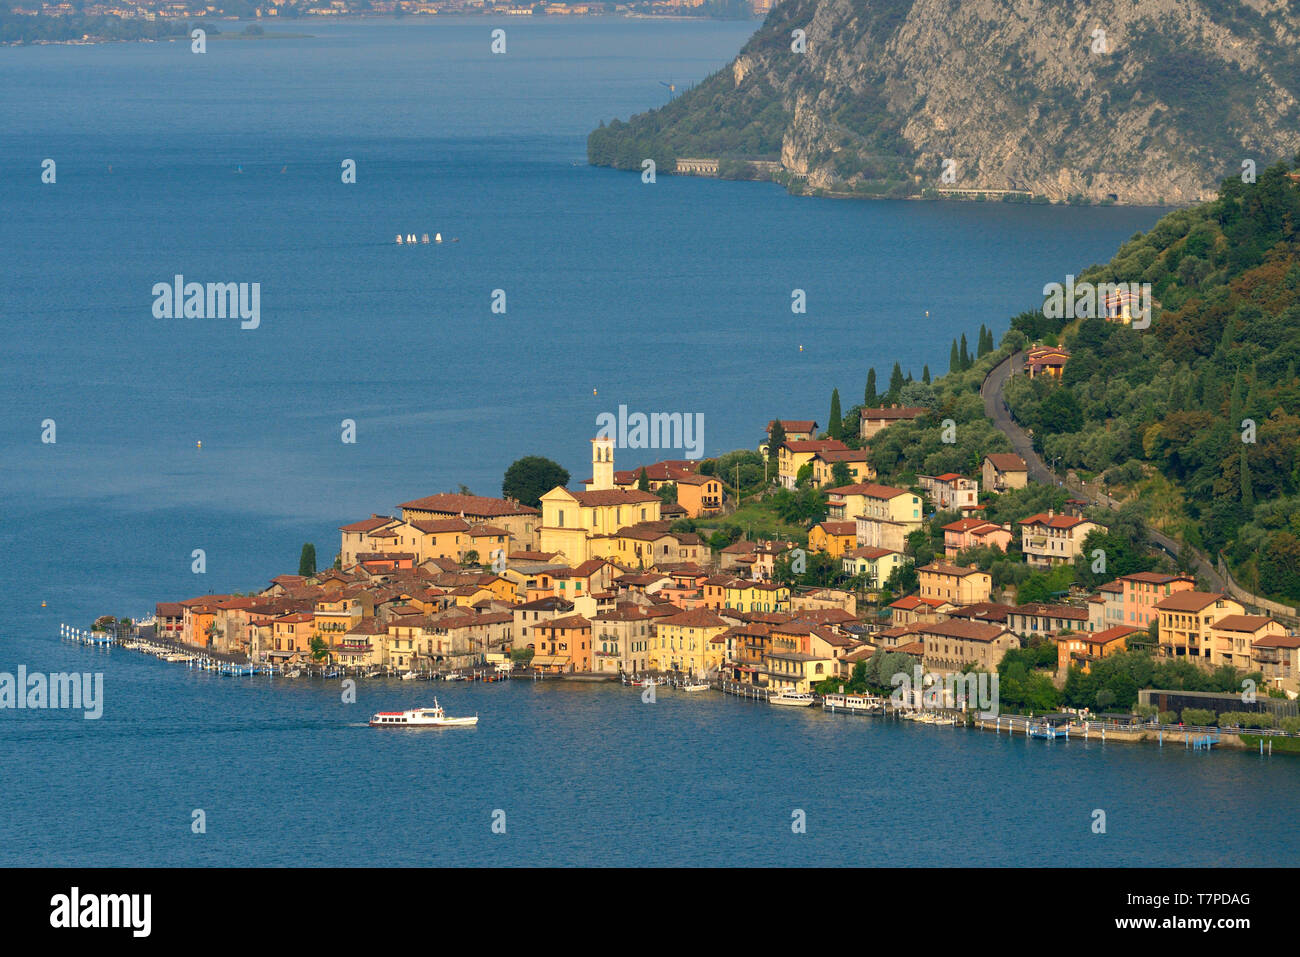 Italy, Lombardy, Iseo lake (Il Lago d'Iseo), Monte Isola island, Peschiera Maraglio village - Stock Image